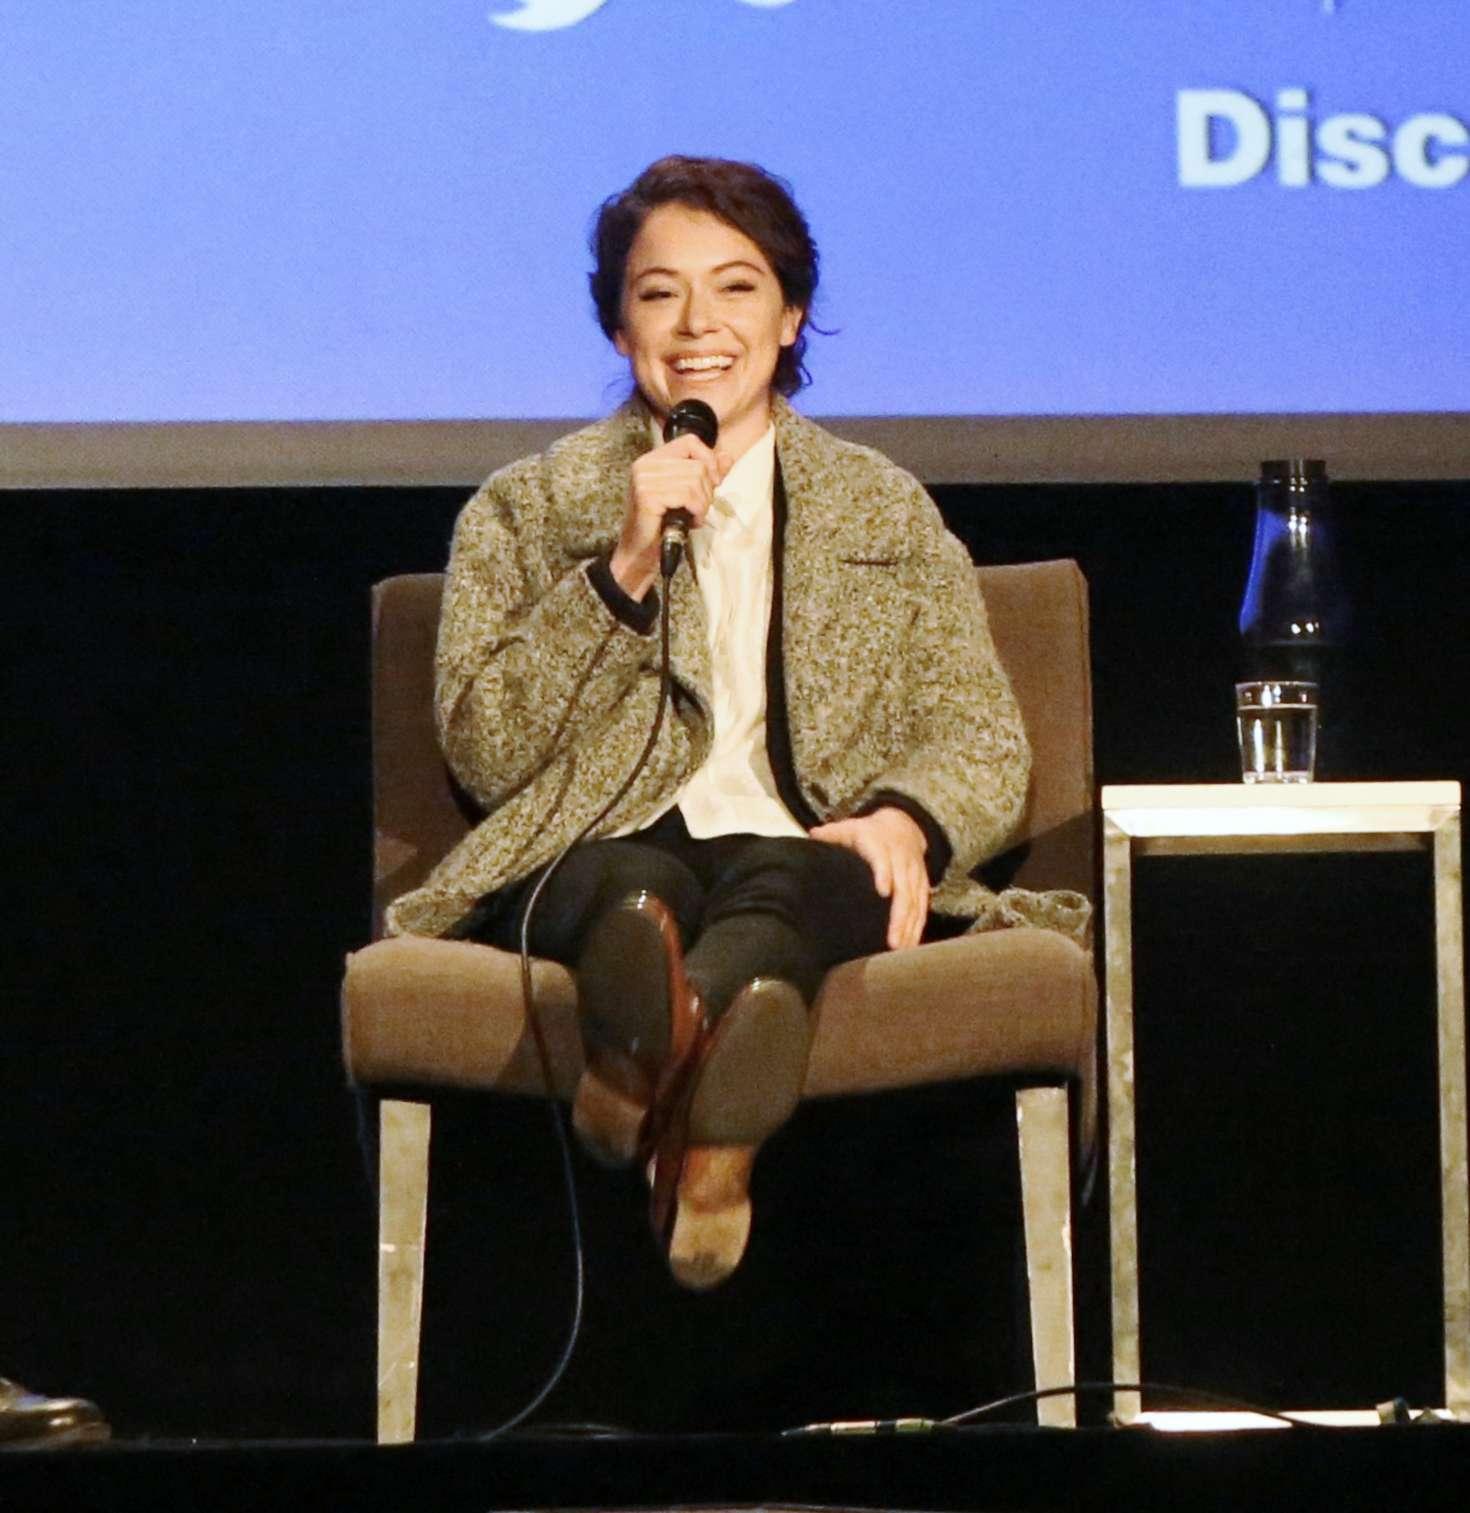 Uncategorized 2016 : Tatiana Maslany: Speaks at the VIFF in Vancouver-35